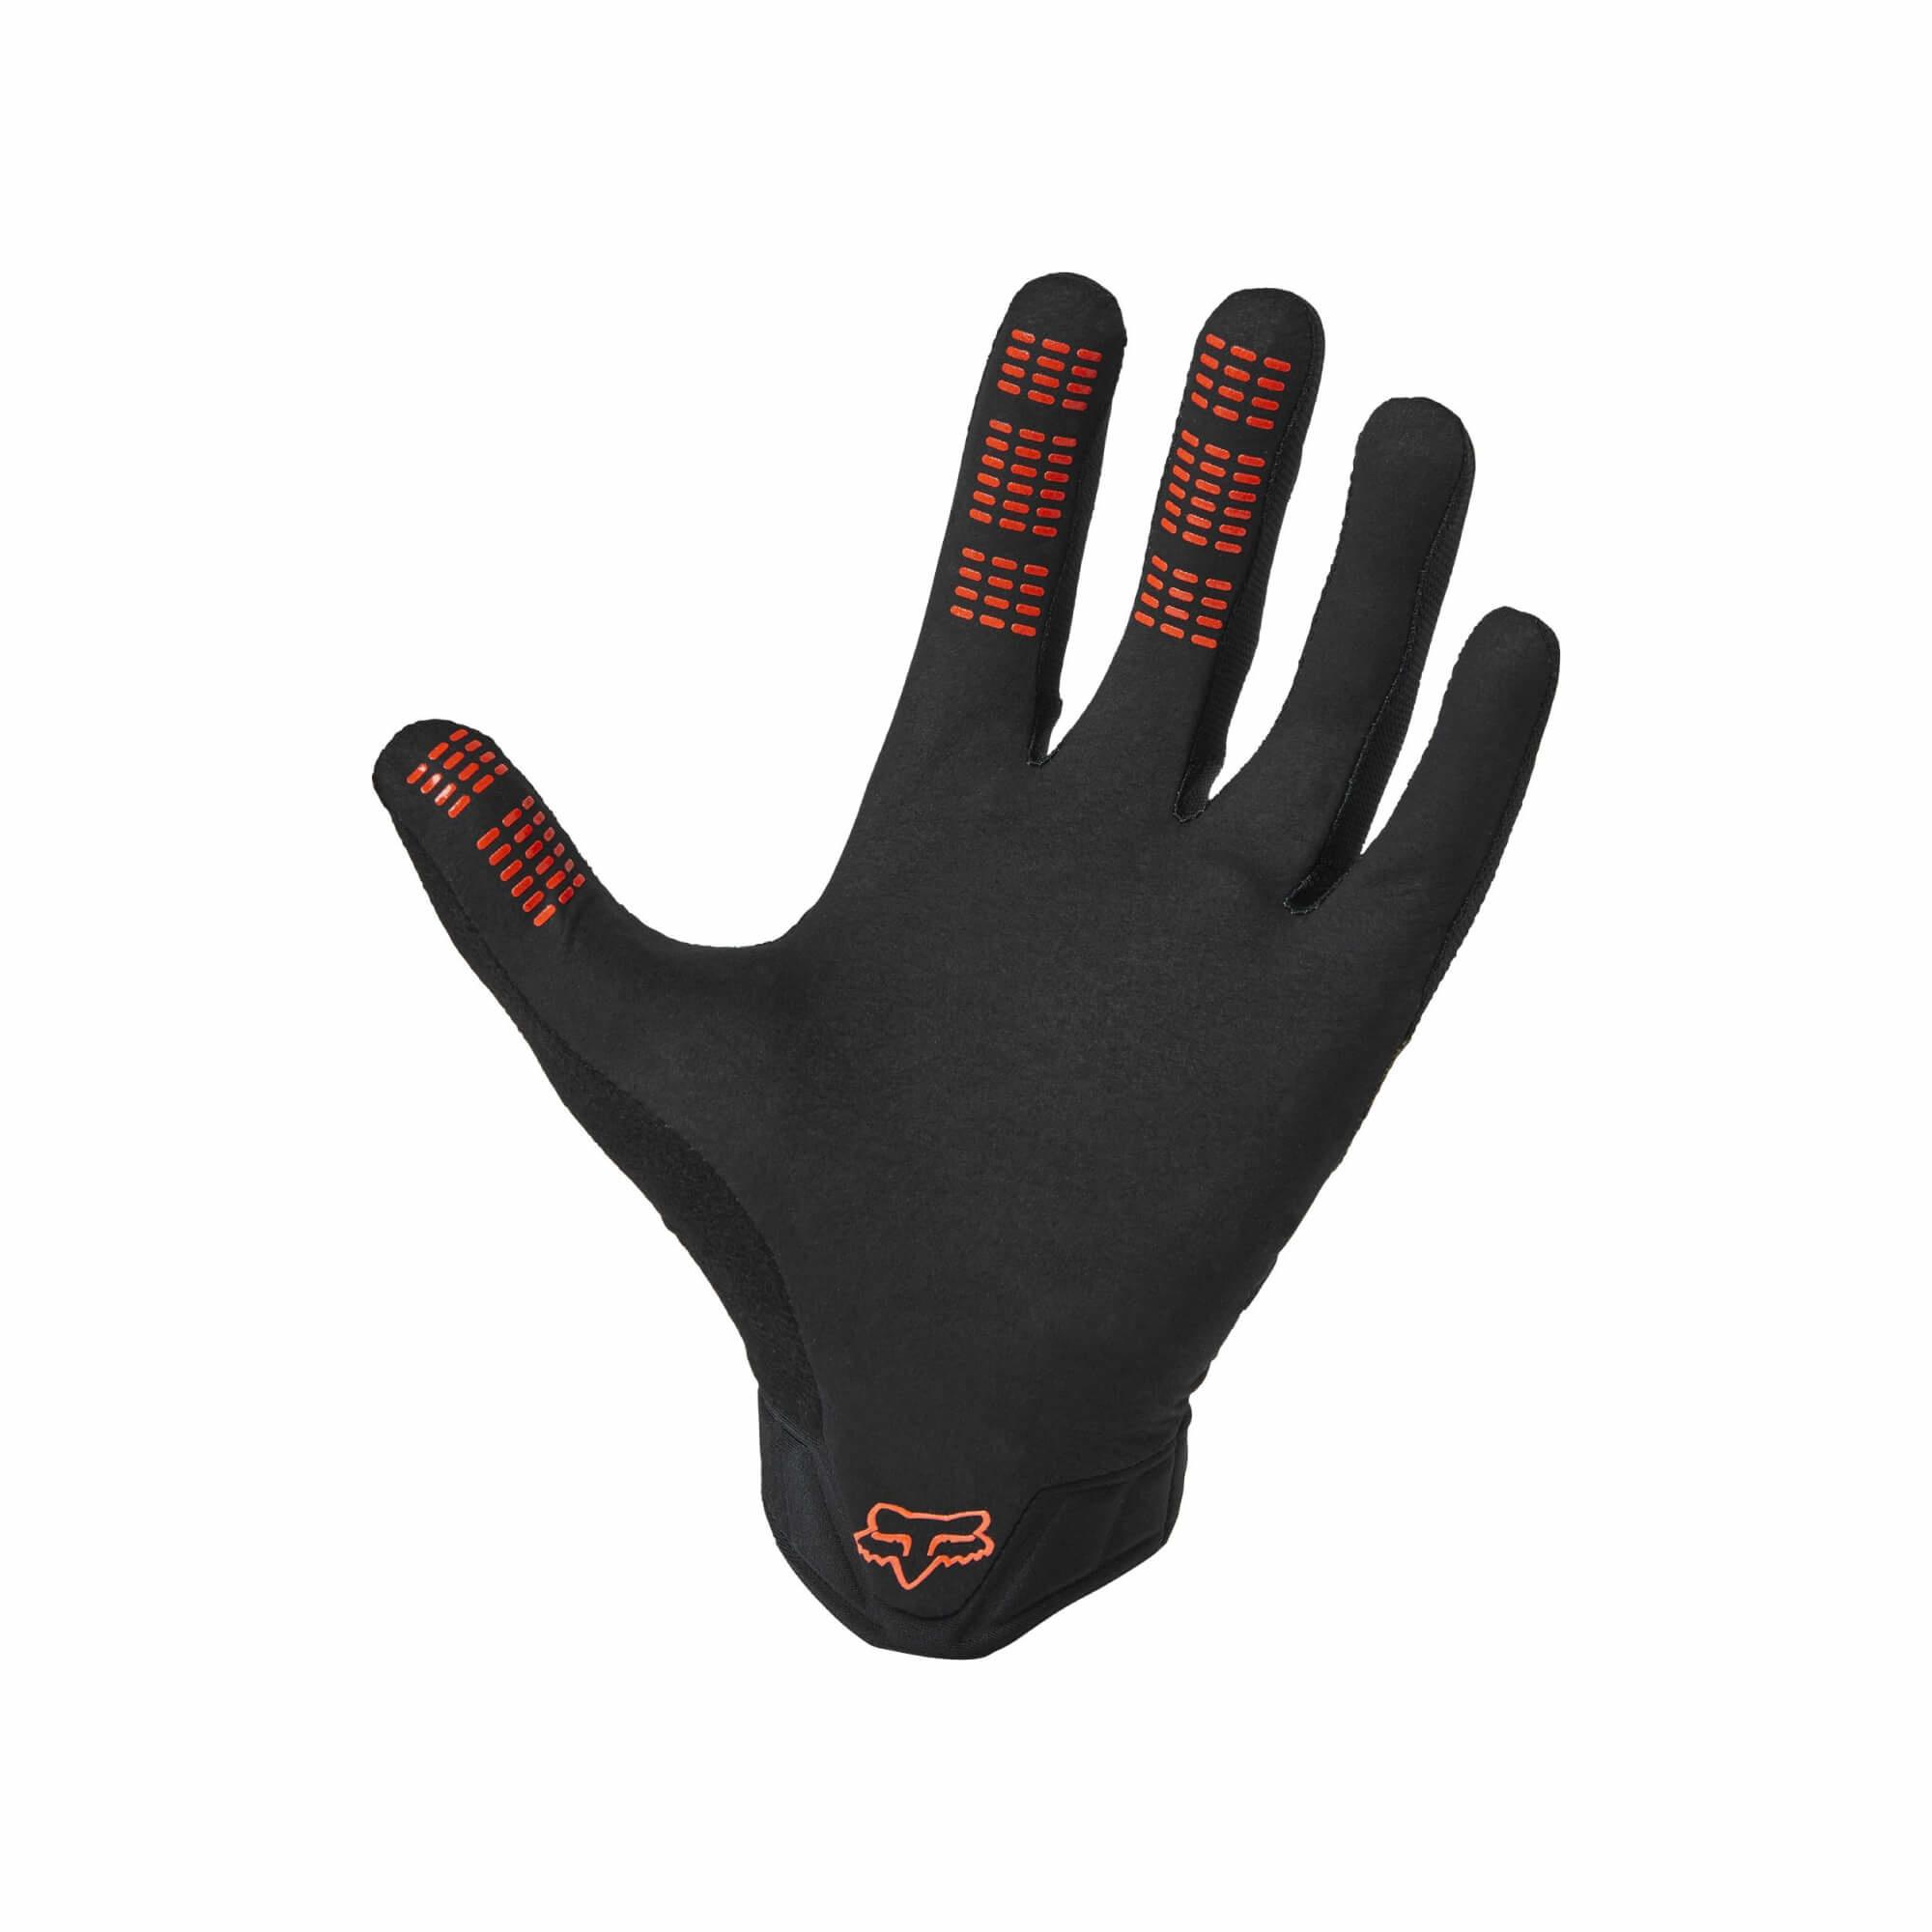 Flexair Ascent Glove Adv 2021-2